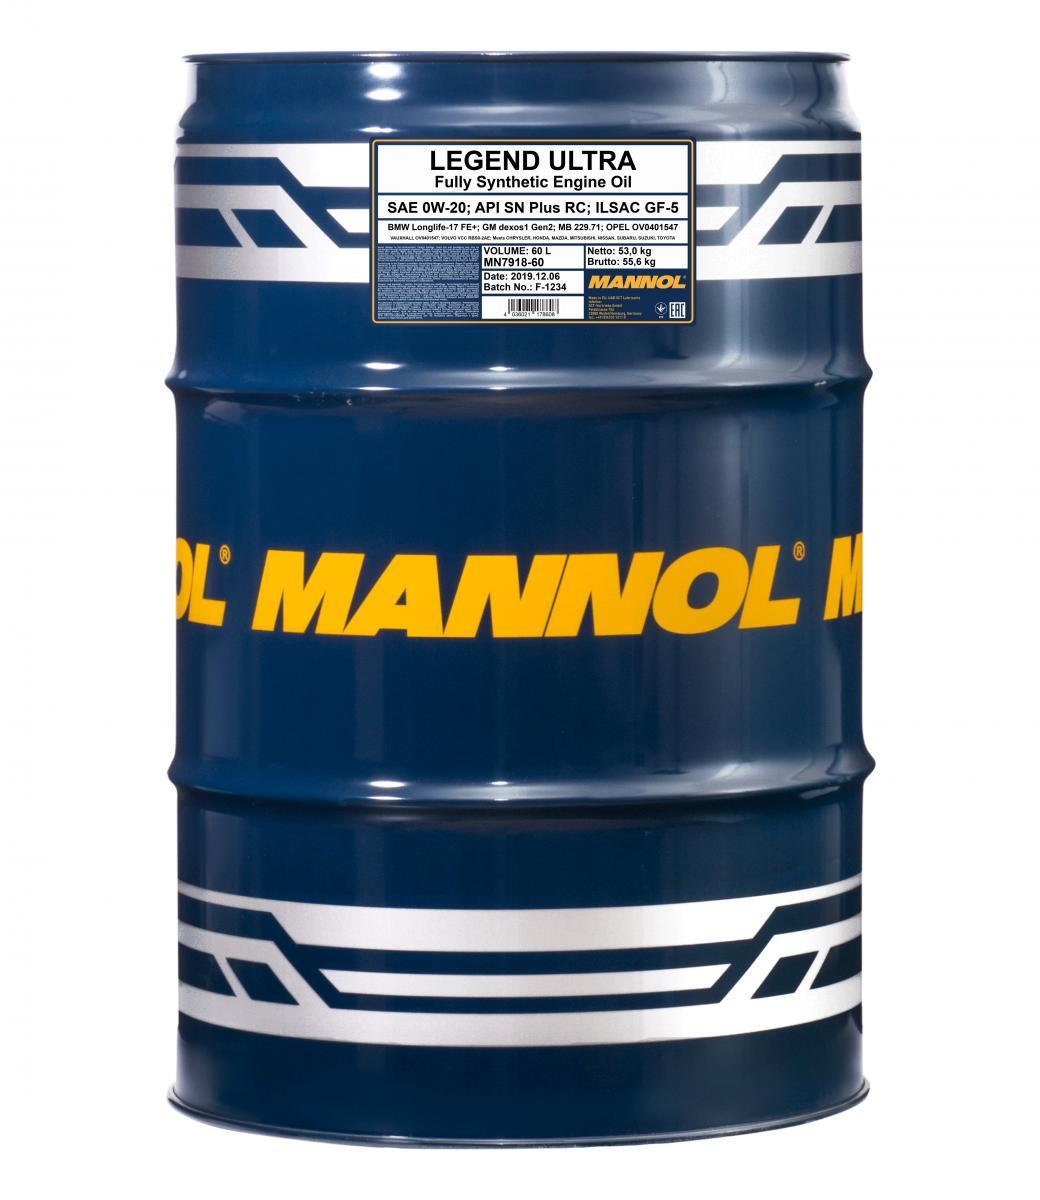 MANNOL LEGEND, ULTRA MN7918-60 Motoröl